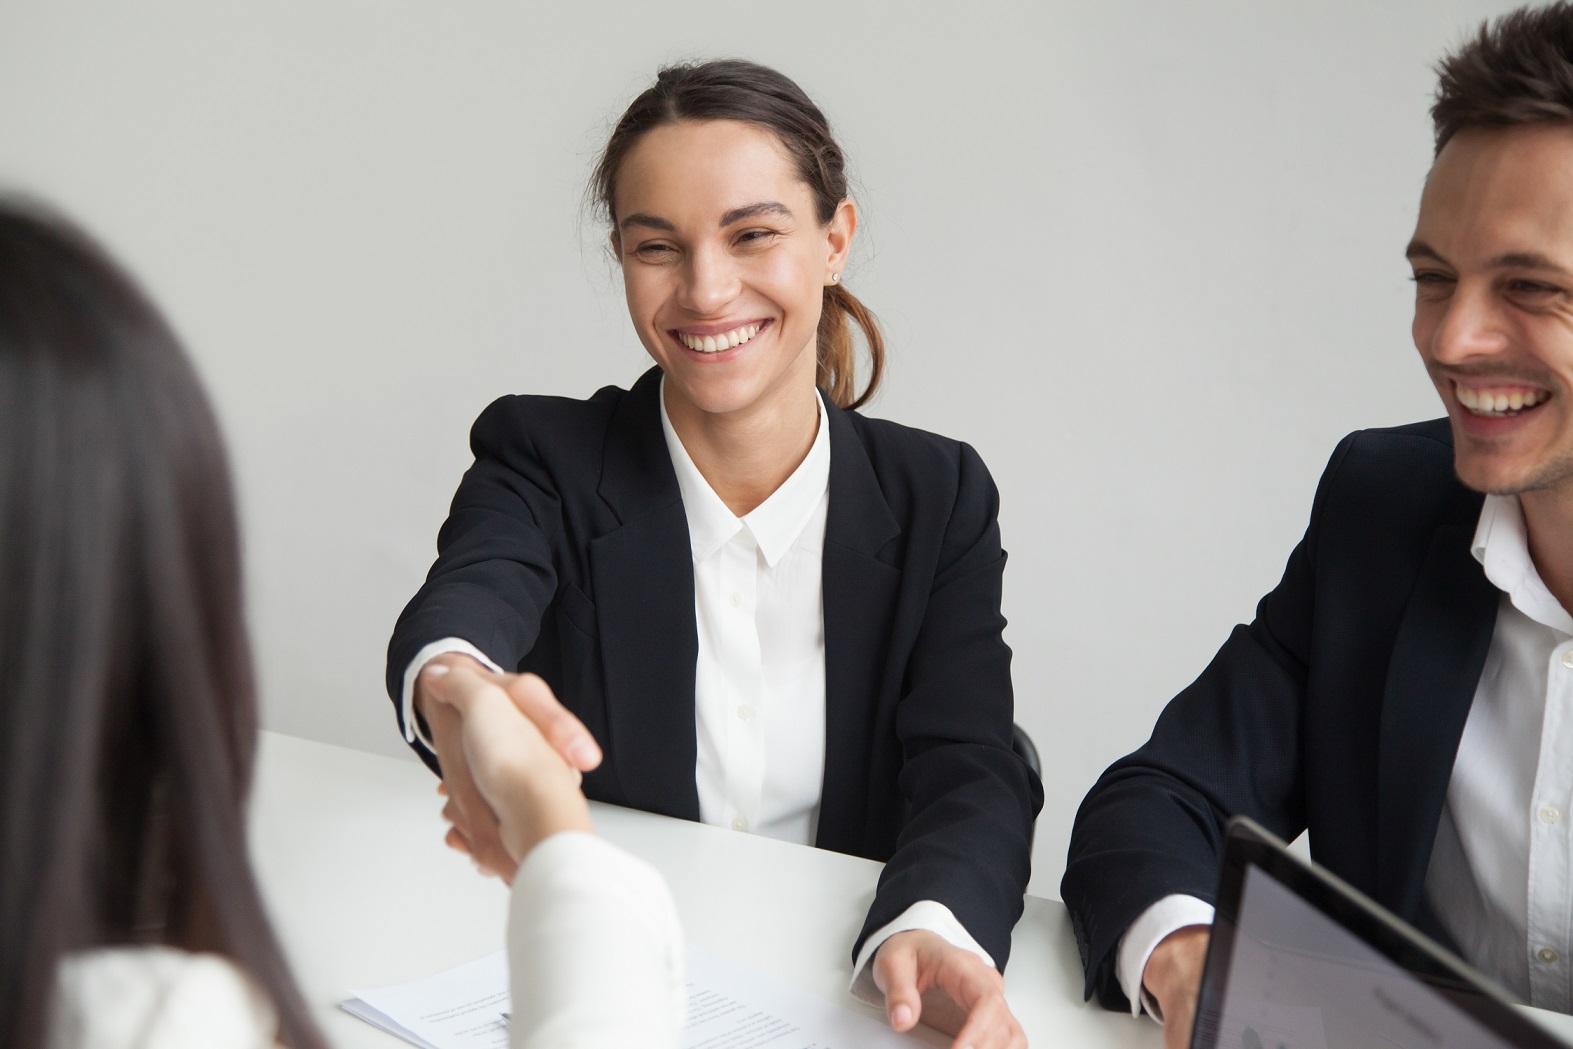 Smiling female hand-shaking her employer